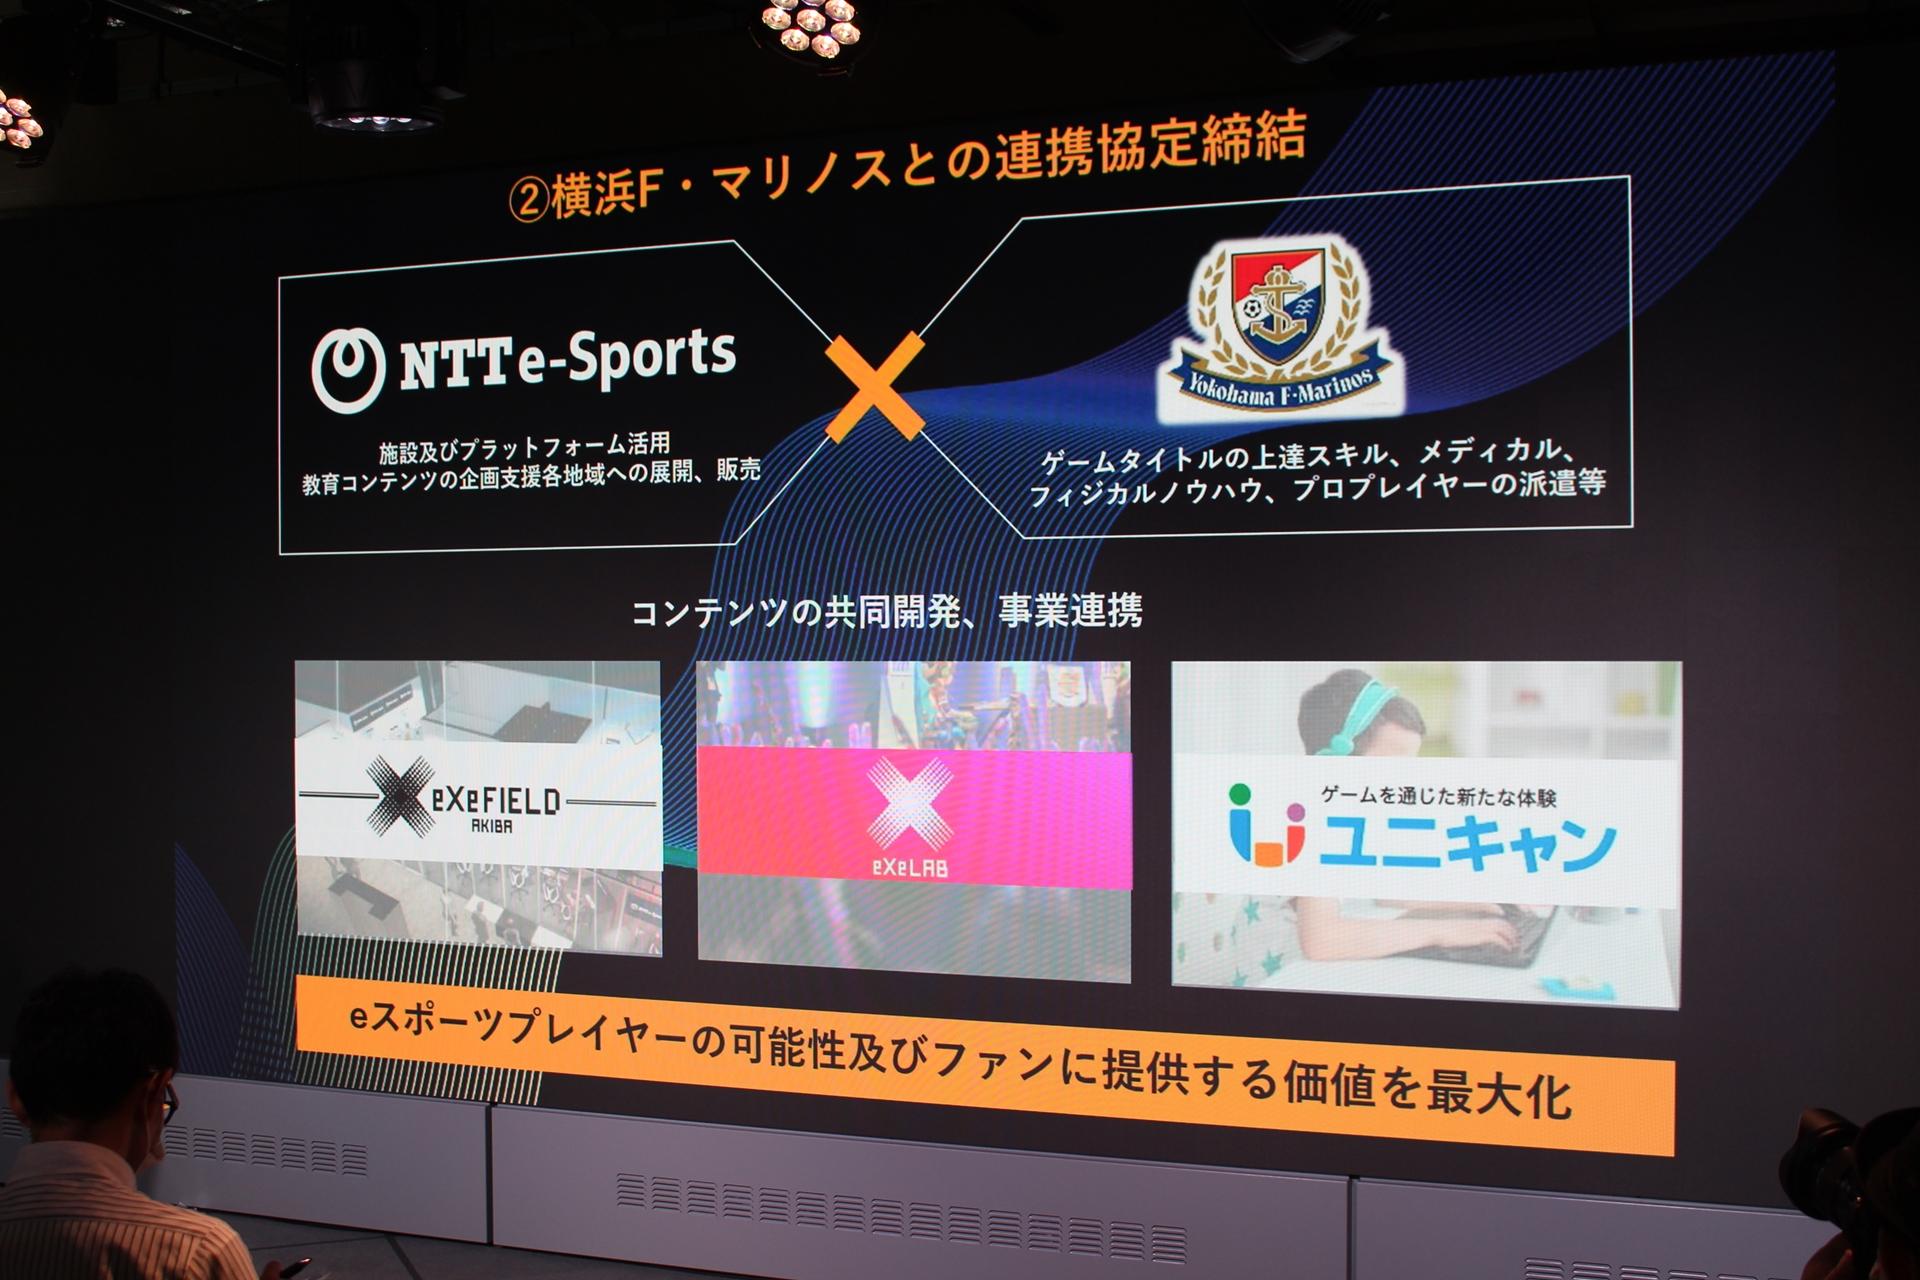 NTTe-Sportsと横浜F・マリノスとのコンテンツの共同開発及び事業連携が実現